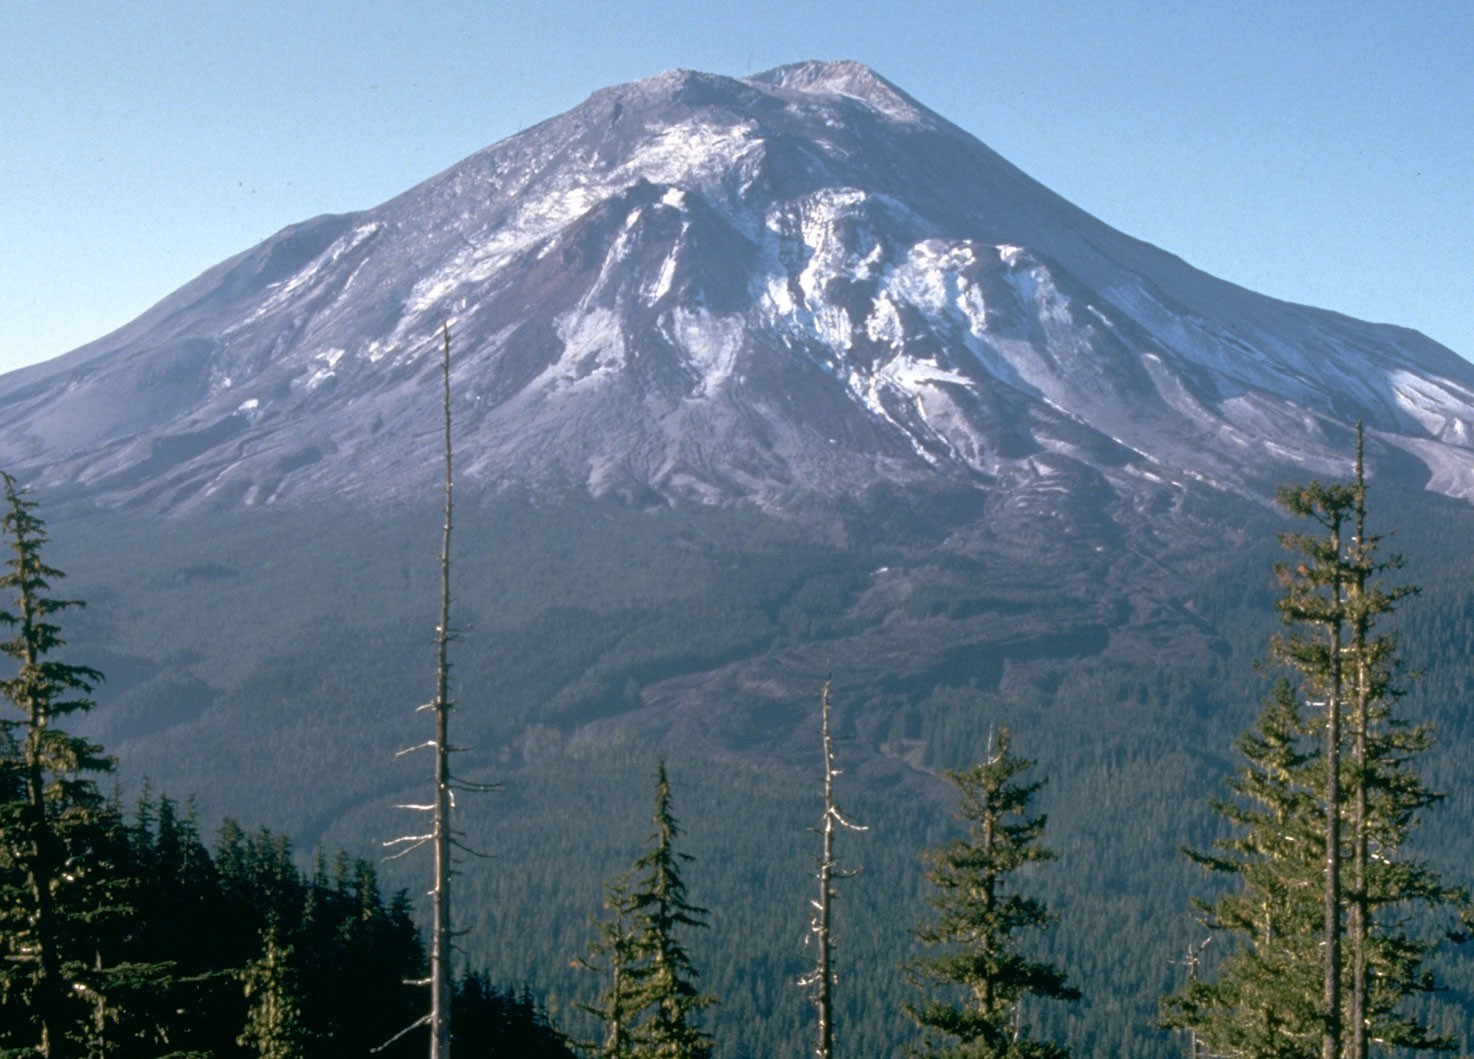 11976-mt-st-helens-before-eruption